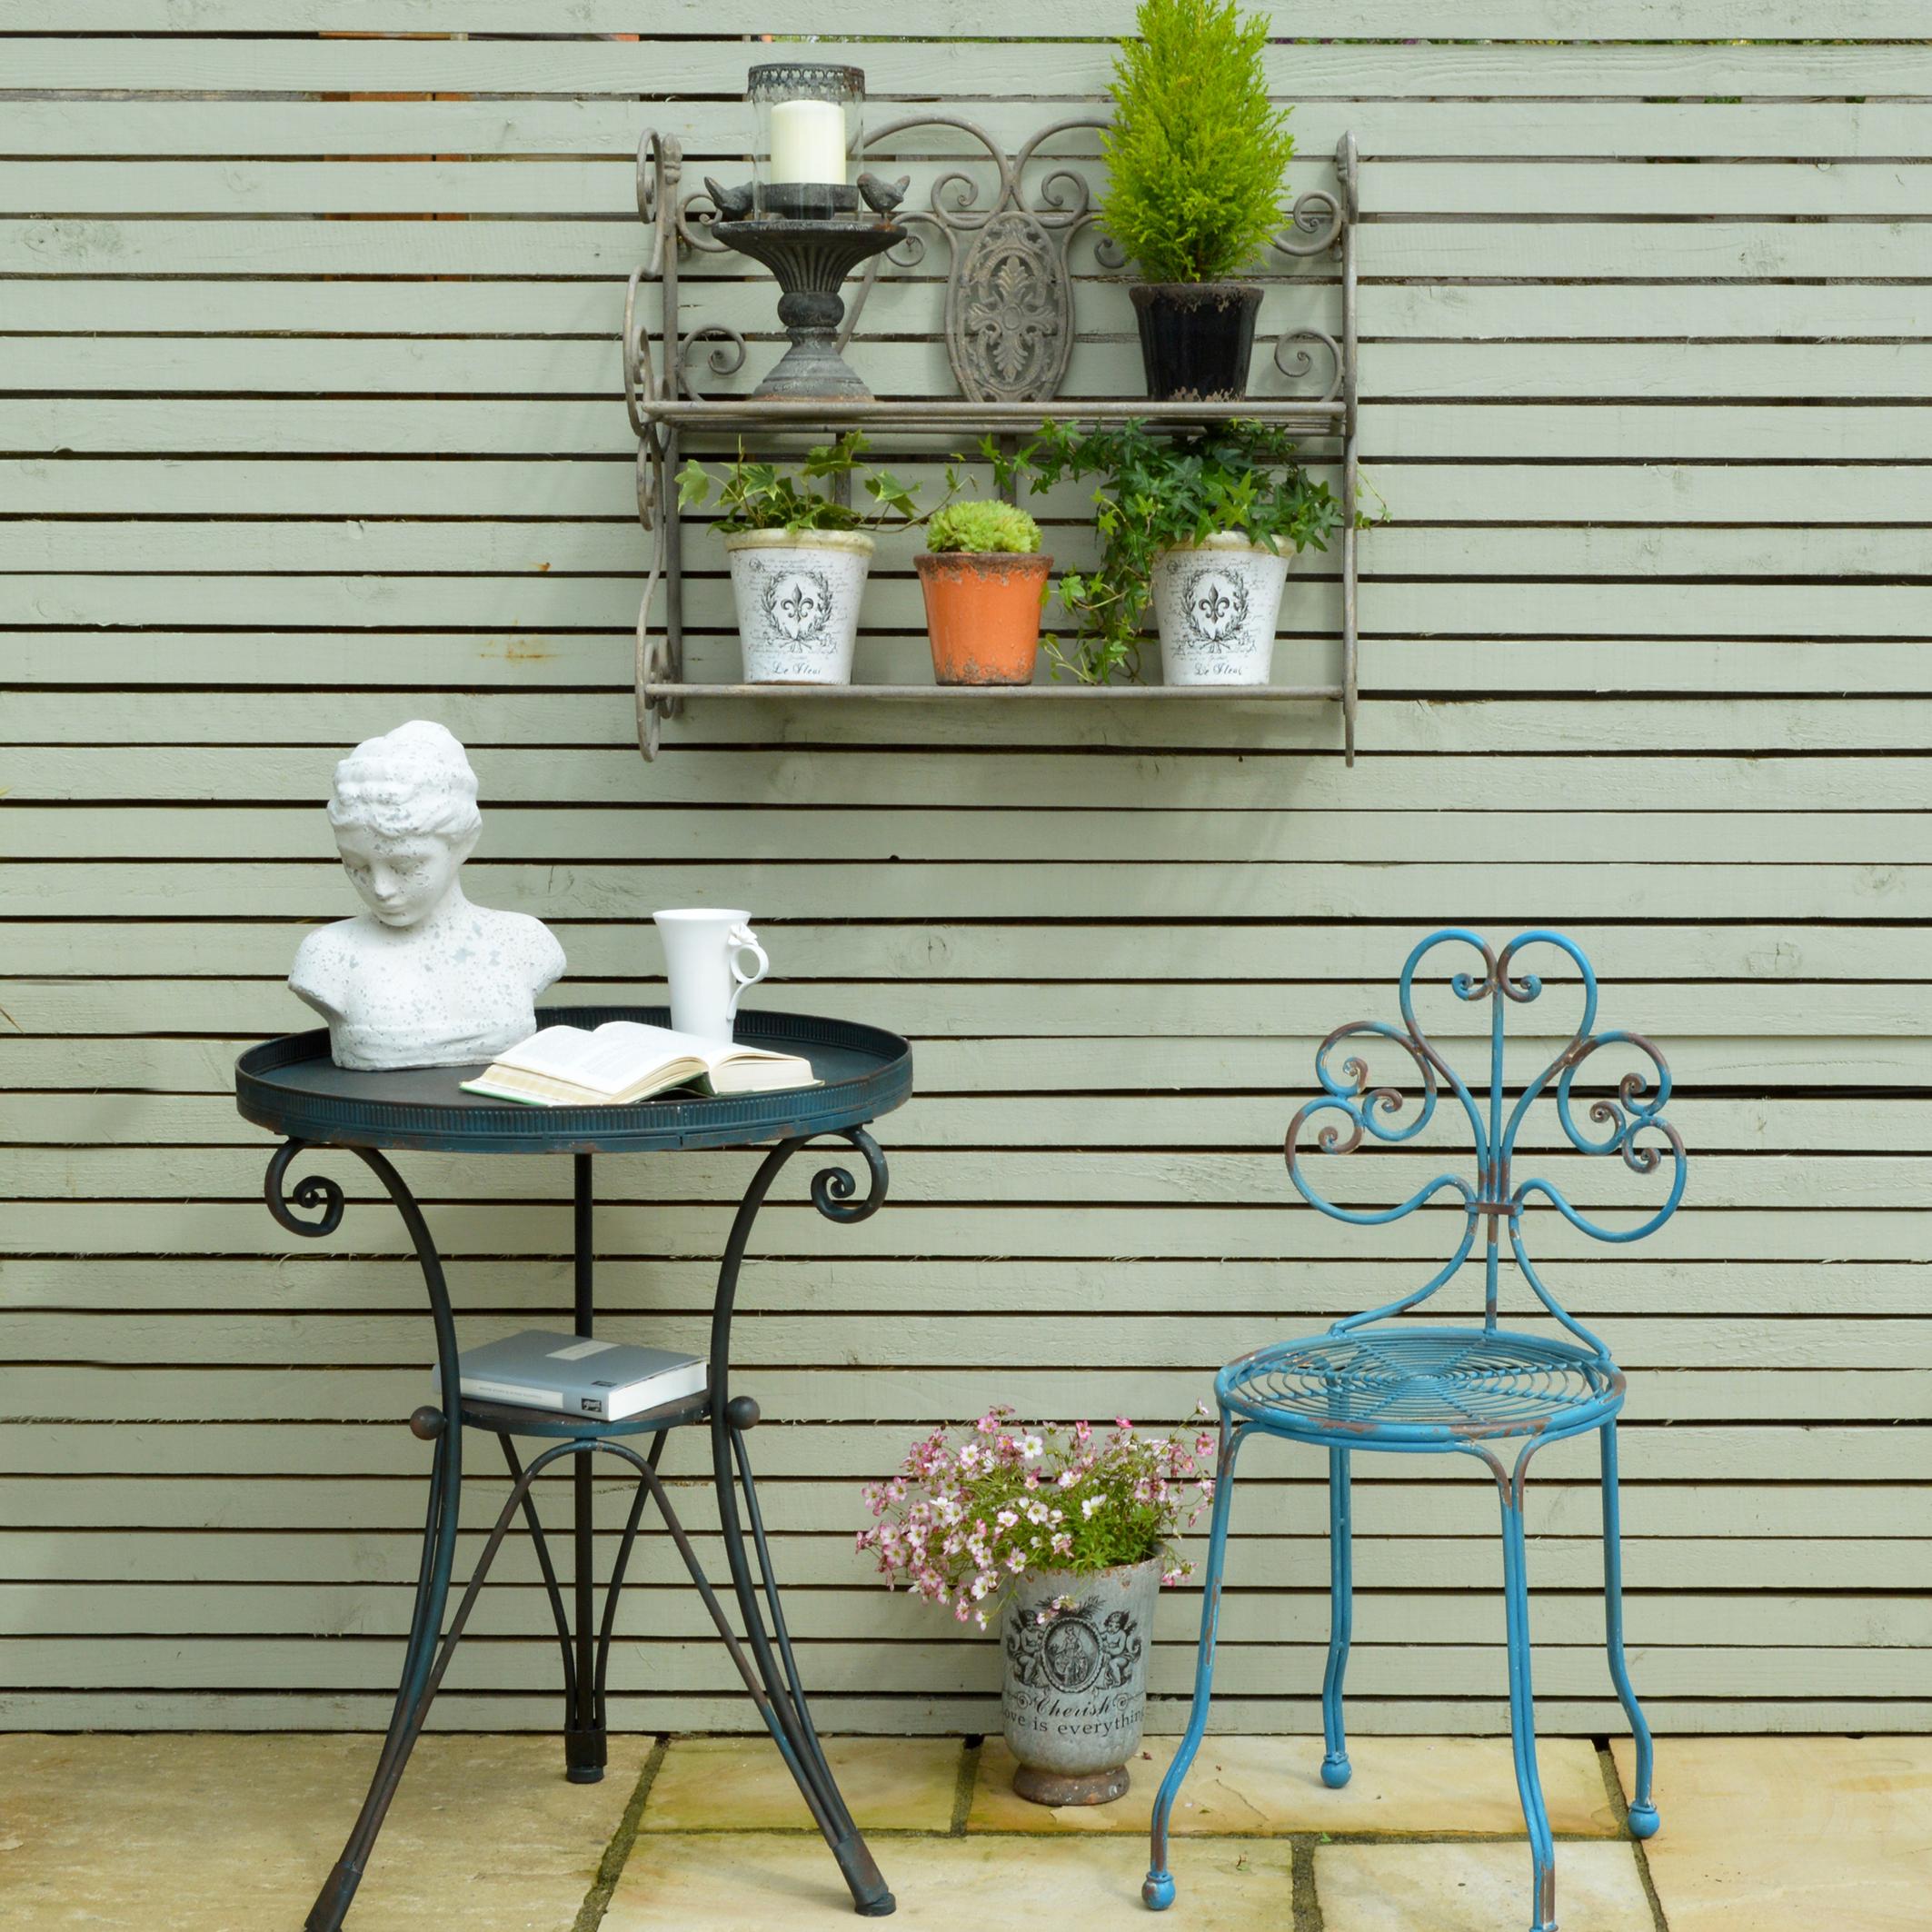 MiaFleur- Garden Wall Shelf £54.  Iron Garden Table £142. Iron Ornate Garden Chair £116. Accessories from £8.95